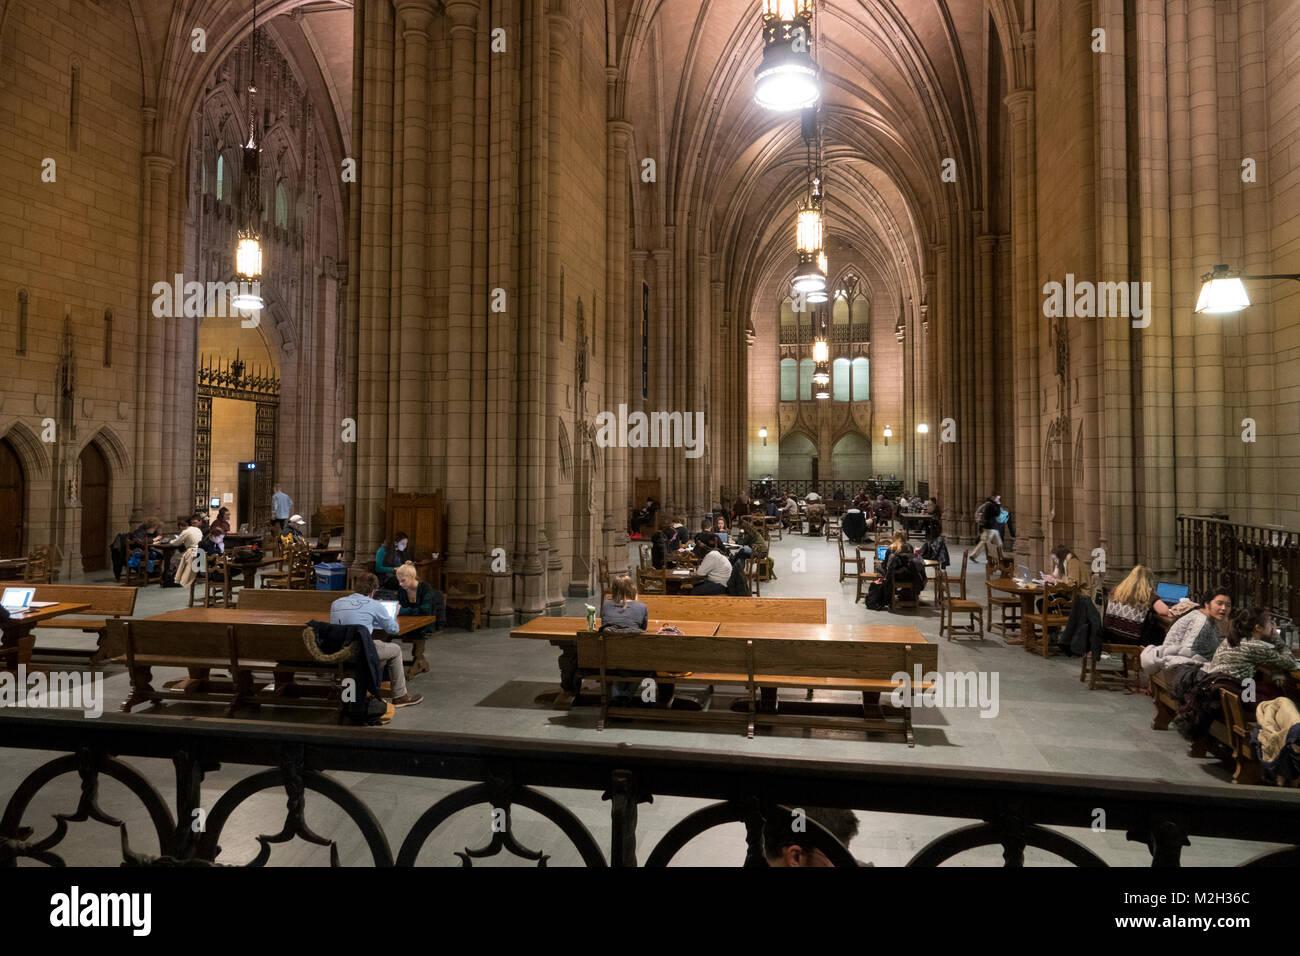 University Of Pennsylvania Stock Photos & University Of